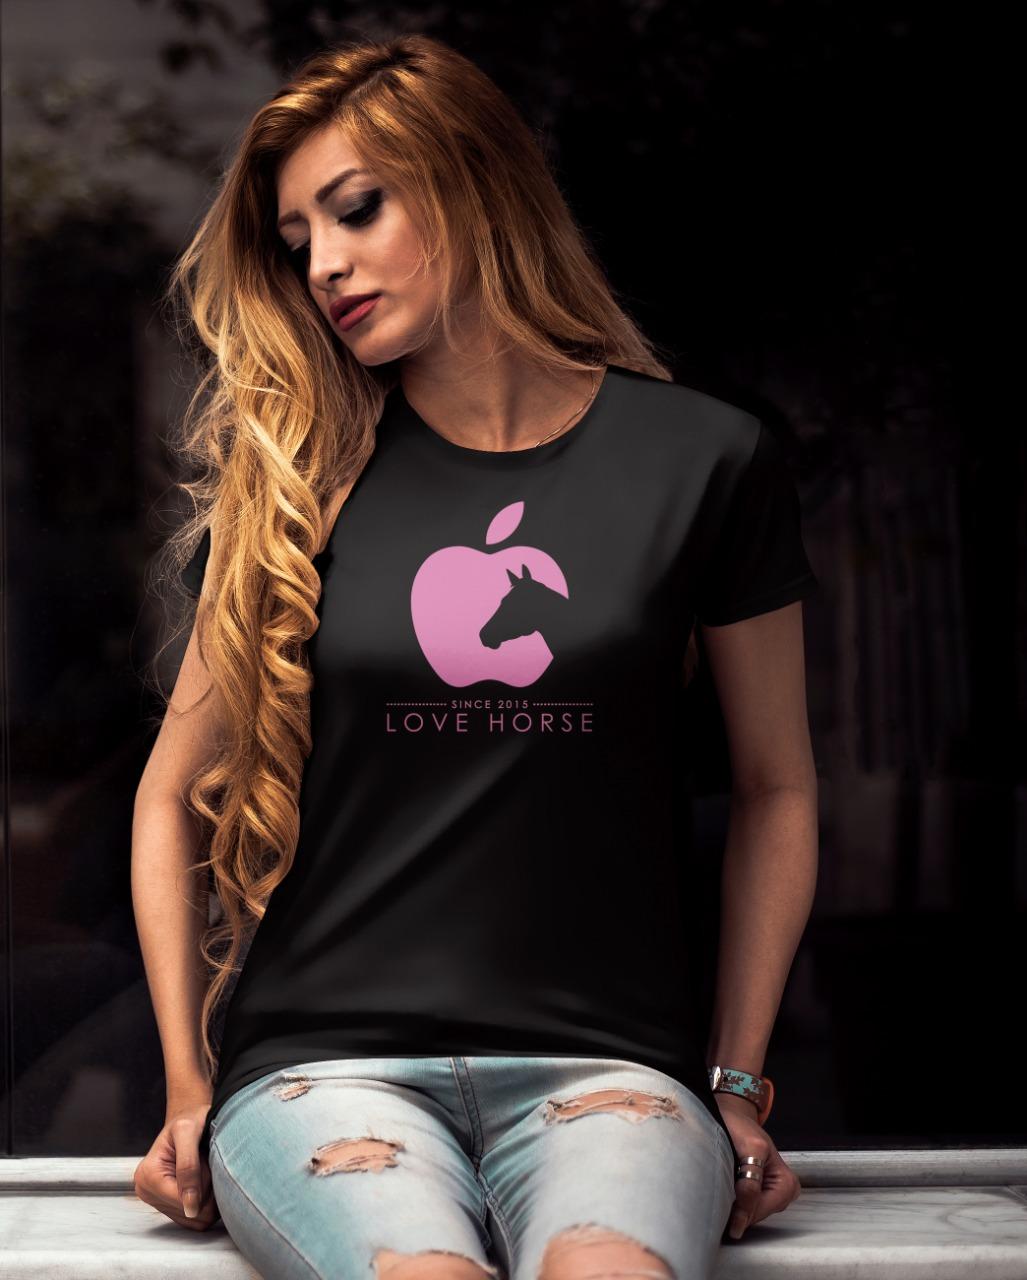 Camiseta Feminina Preta e Rosa Country Love Horse!